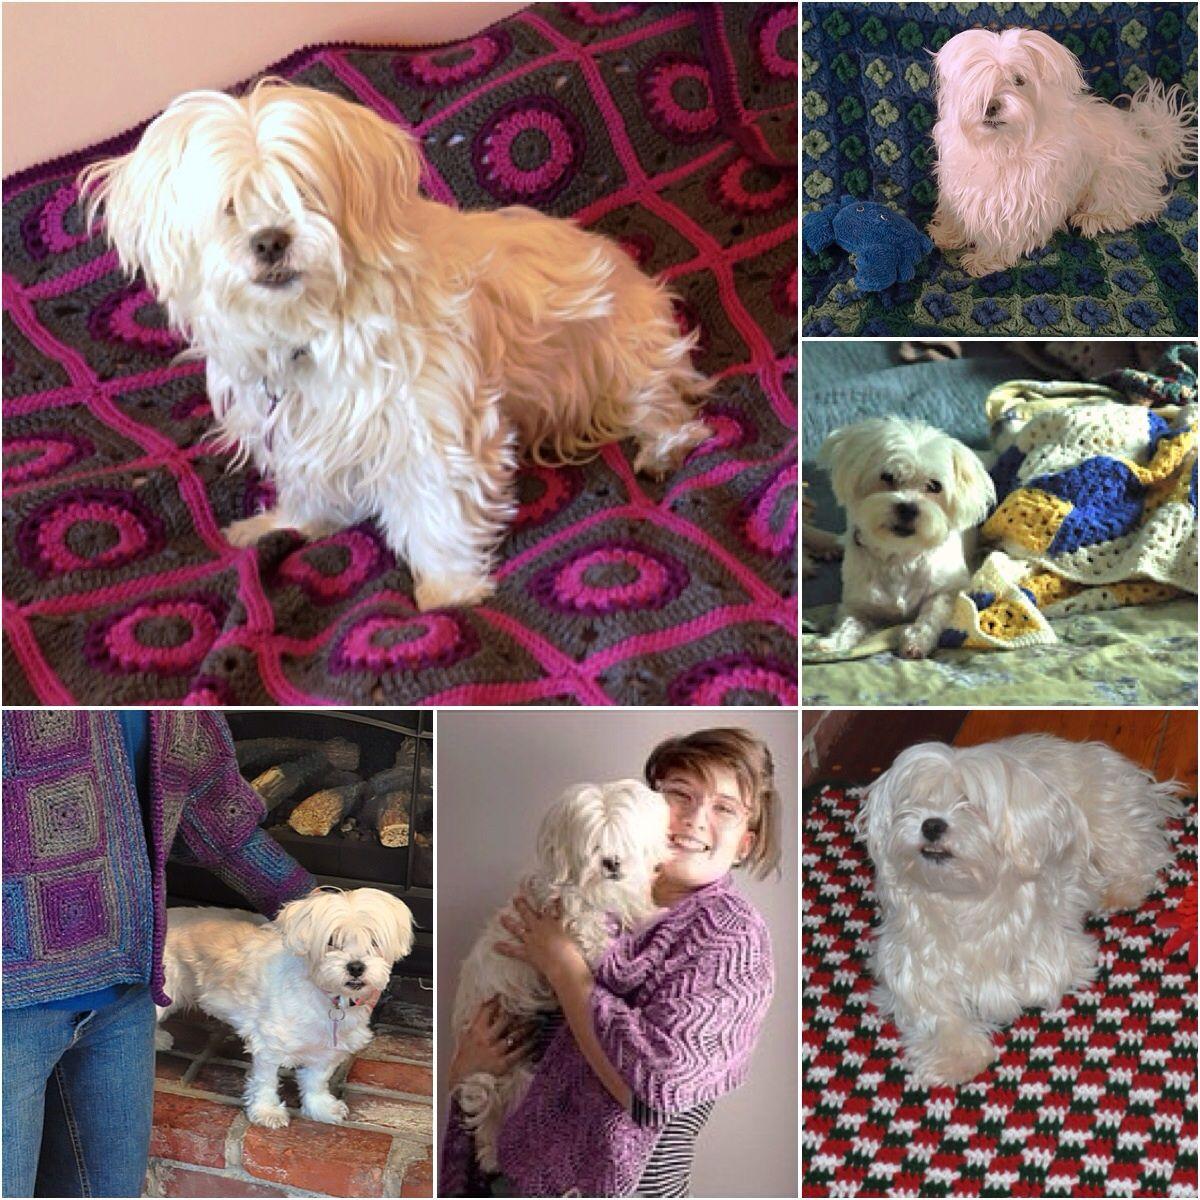 Mika mainly crochet model, dog, & mascot Likes